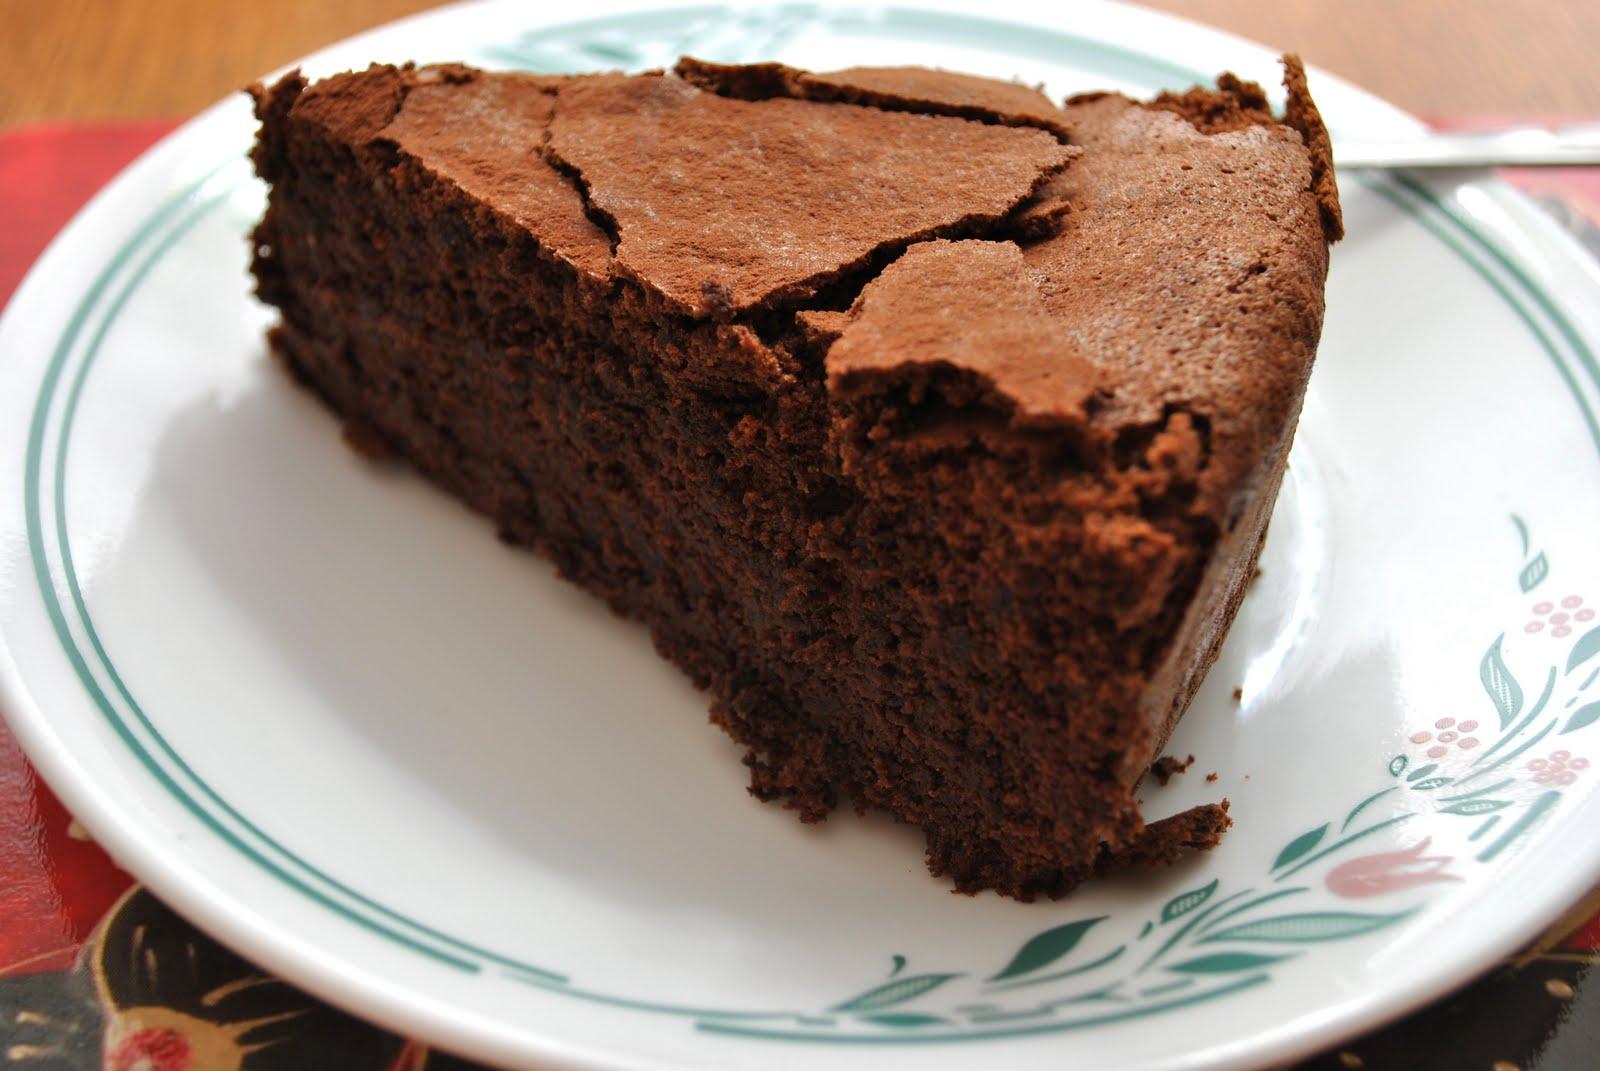 chocolate cake I like to use real chocolate, that is dark chocolate ...